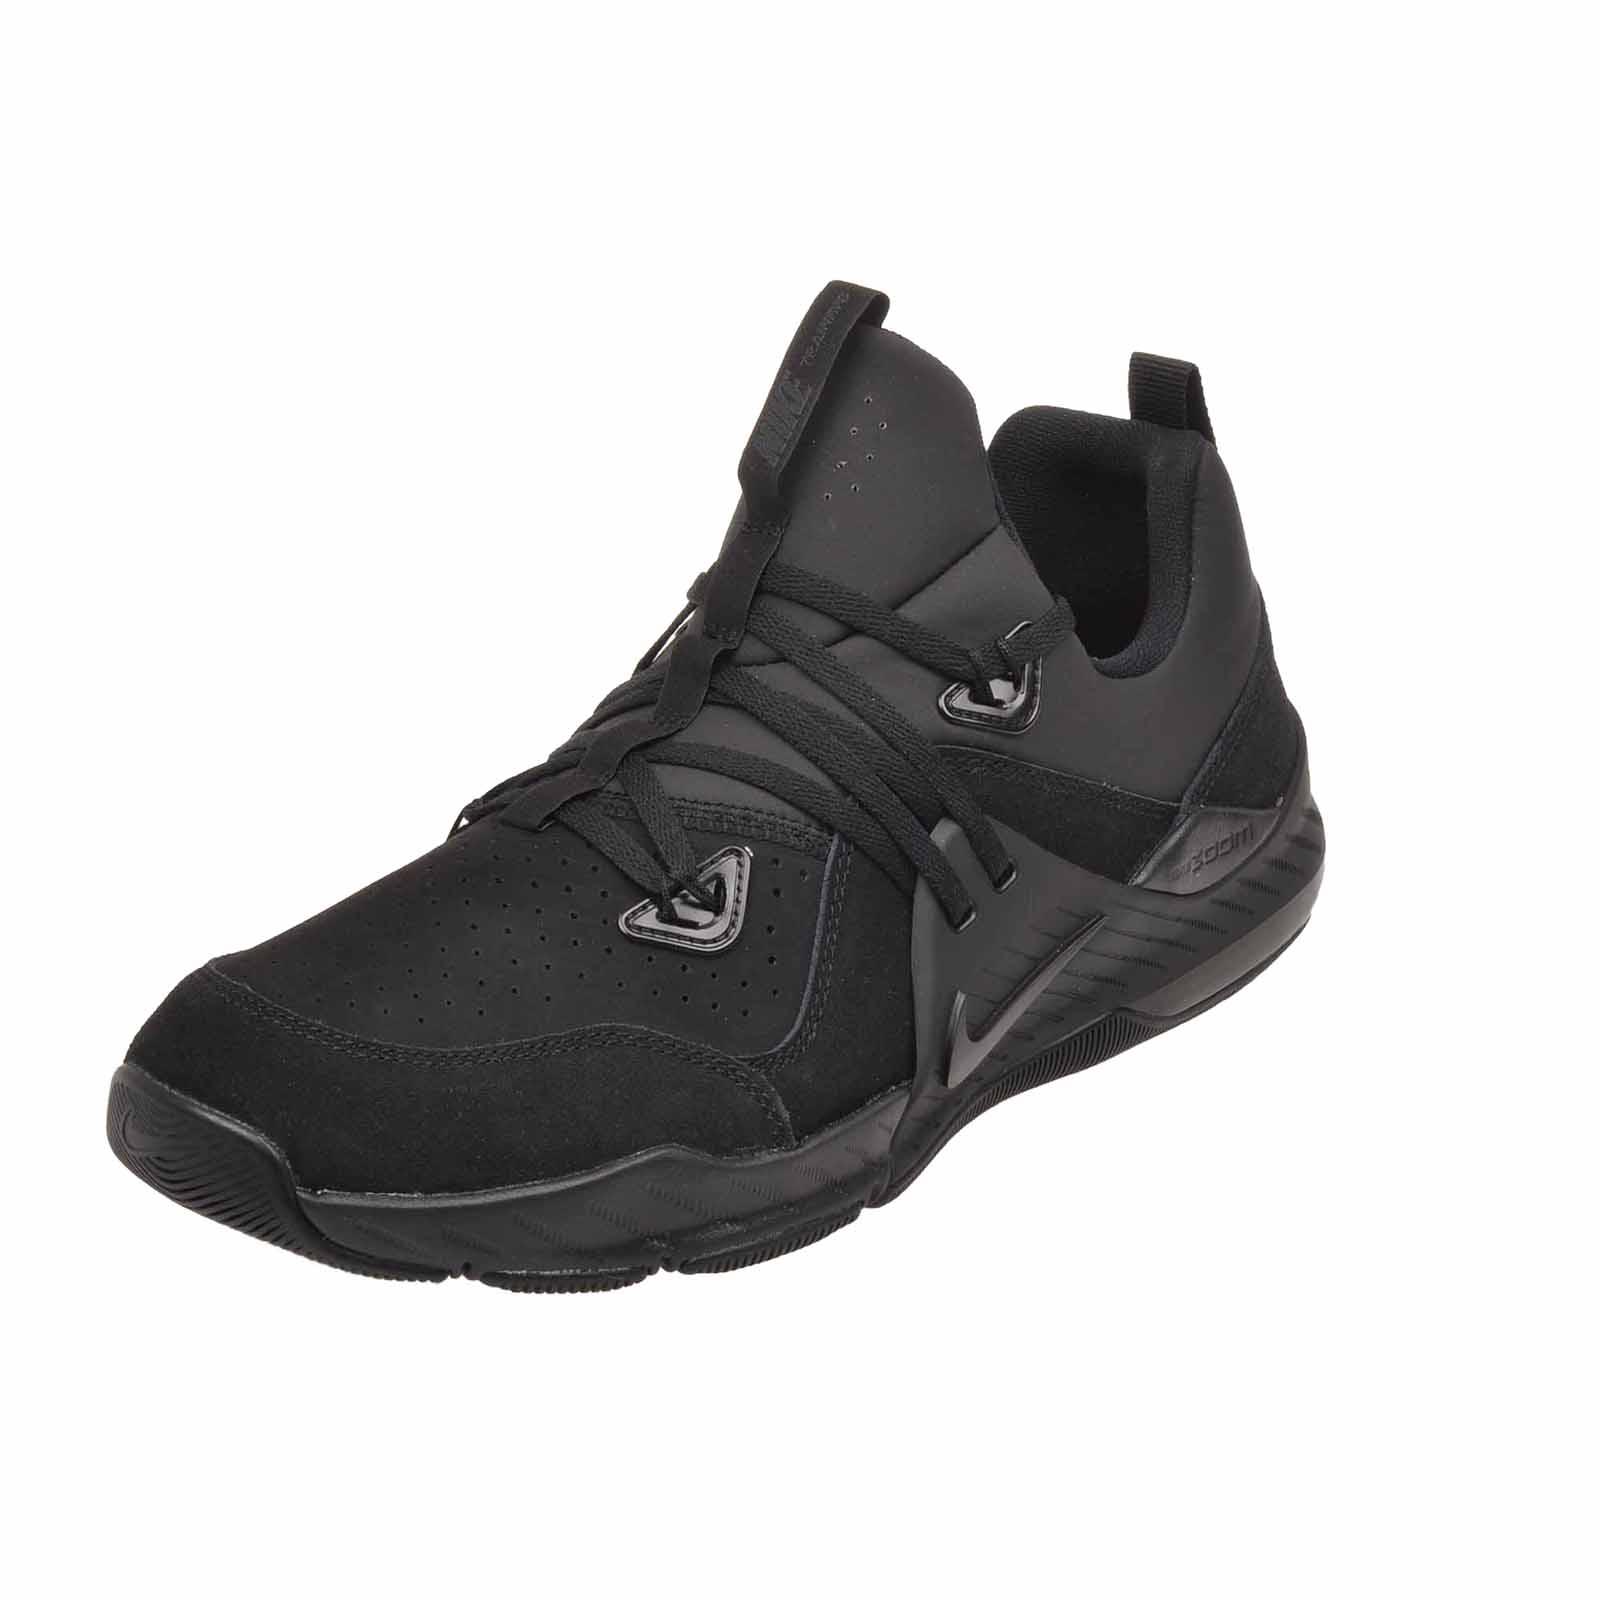 f82a708ebed Nike Zoom Train Command LTHR Cross Training Mens Shoes NWOB AA3984 ...